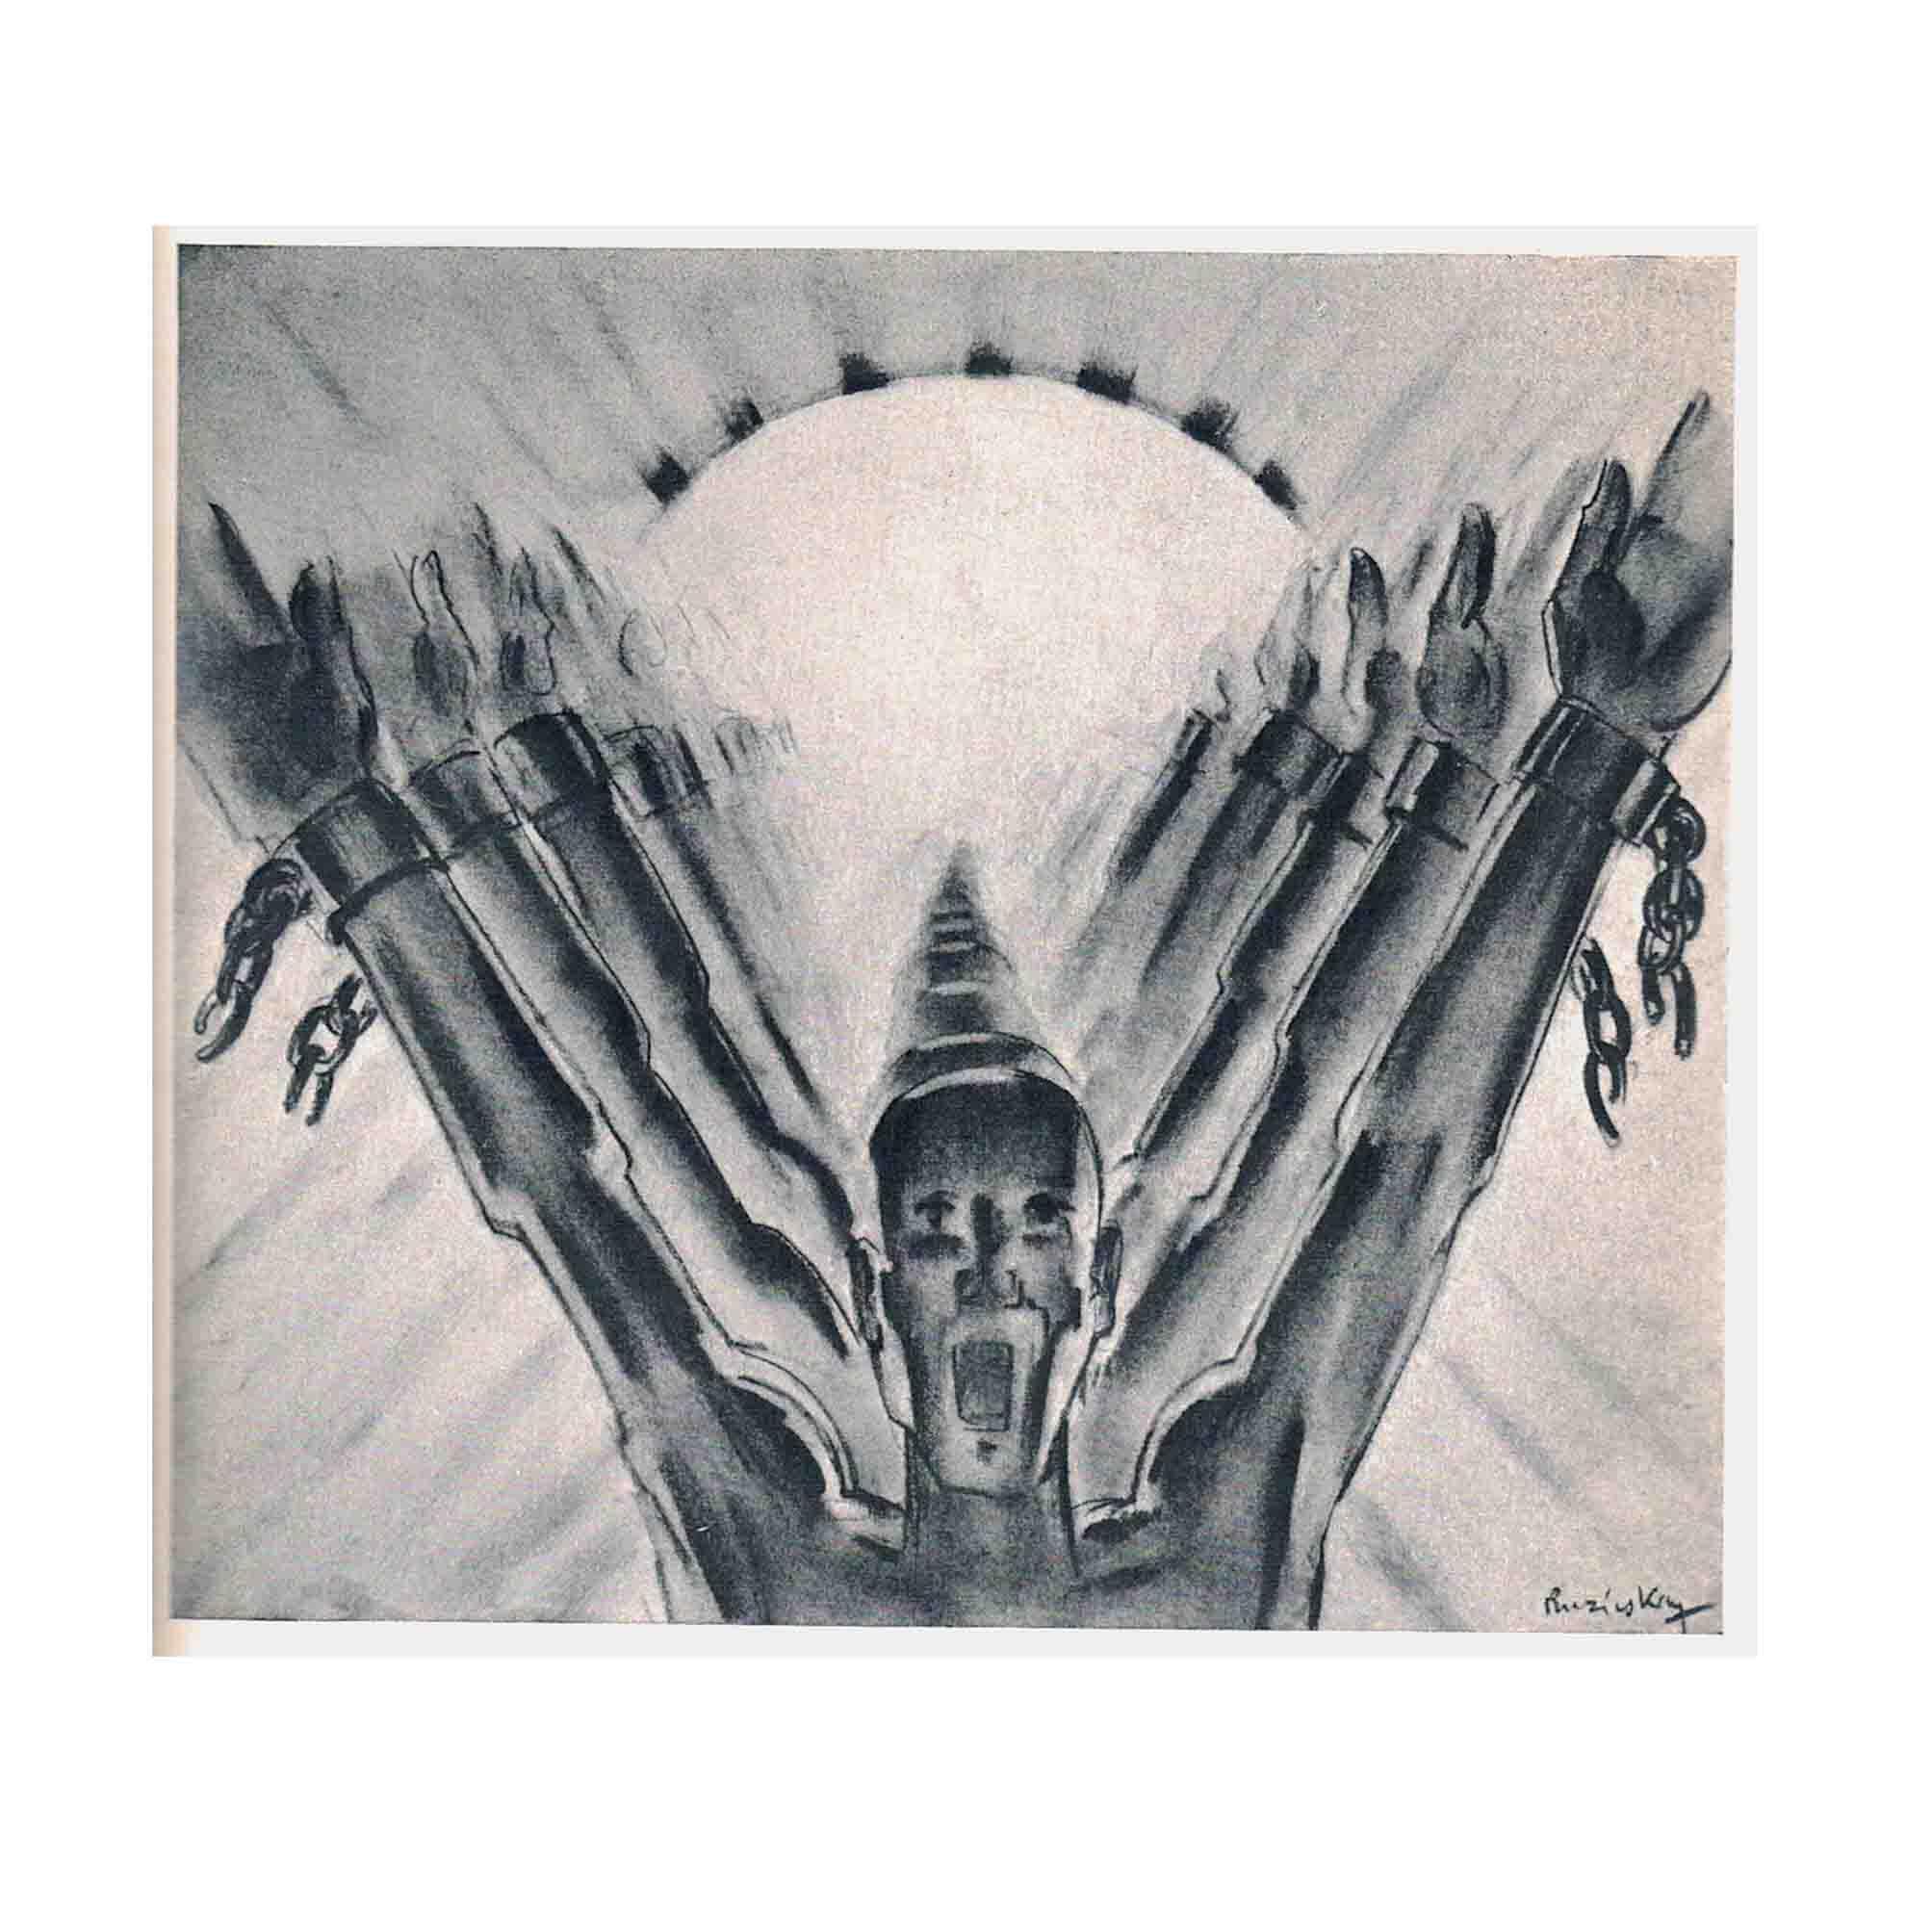 5559 Ruzicskay Vilagossag fele 1936 Illustration 1 A N